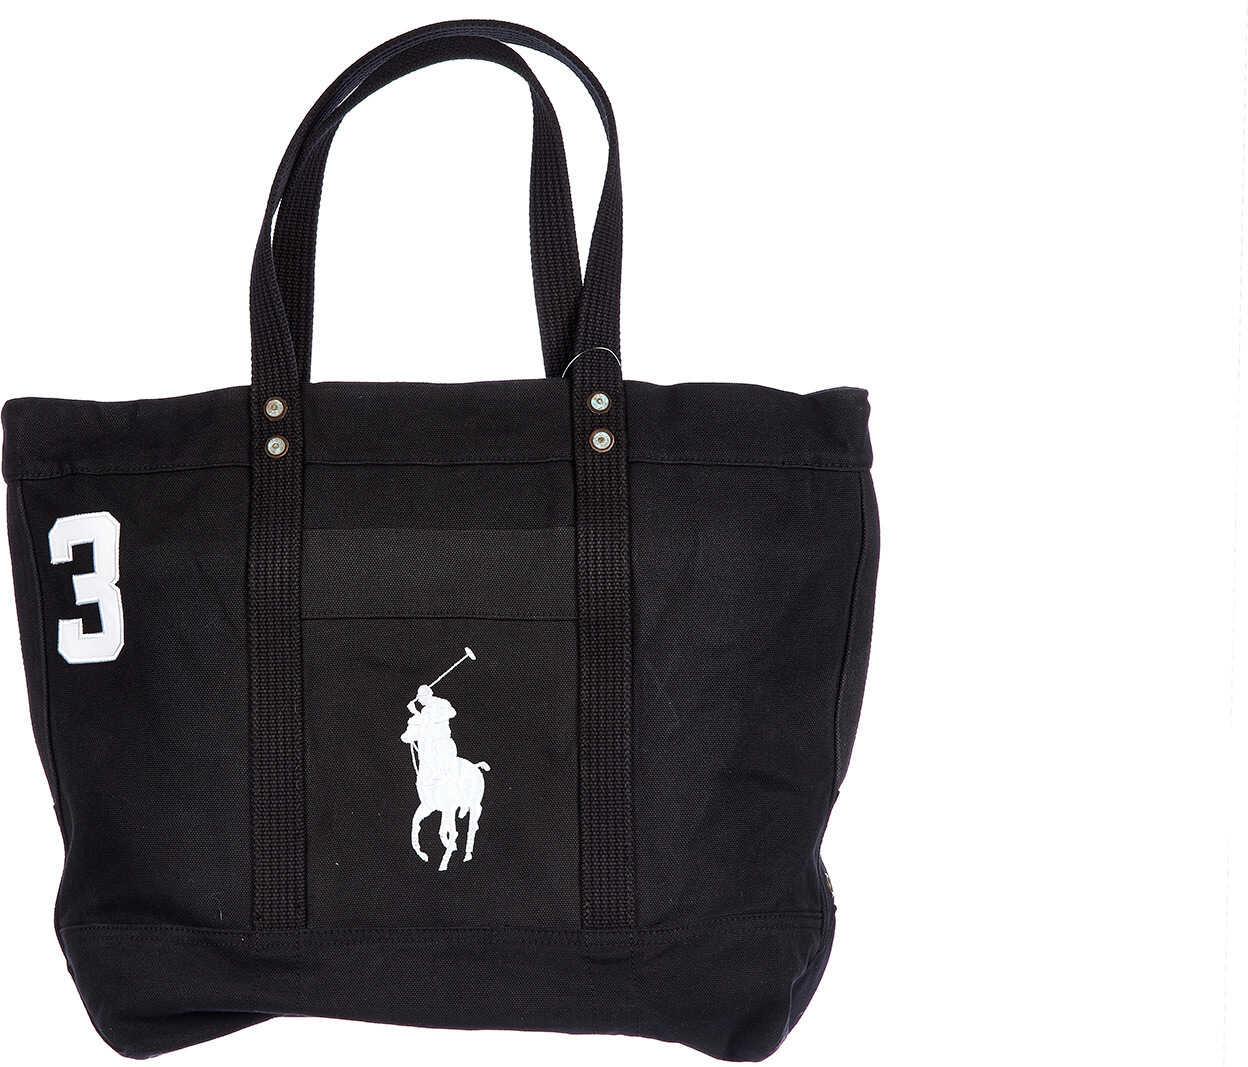 Ralph Lauren Handbag Canvas Black